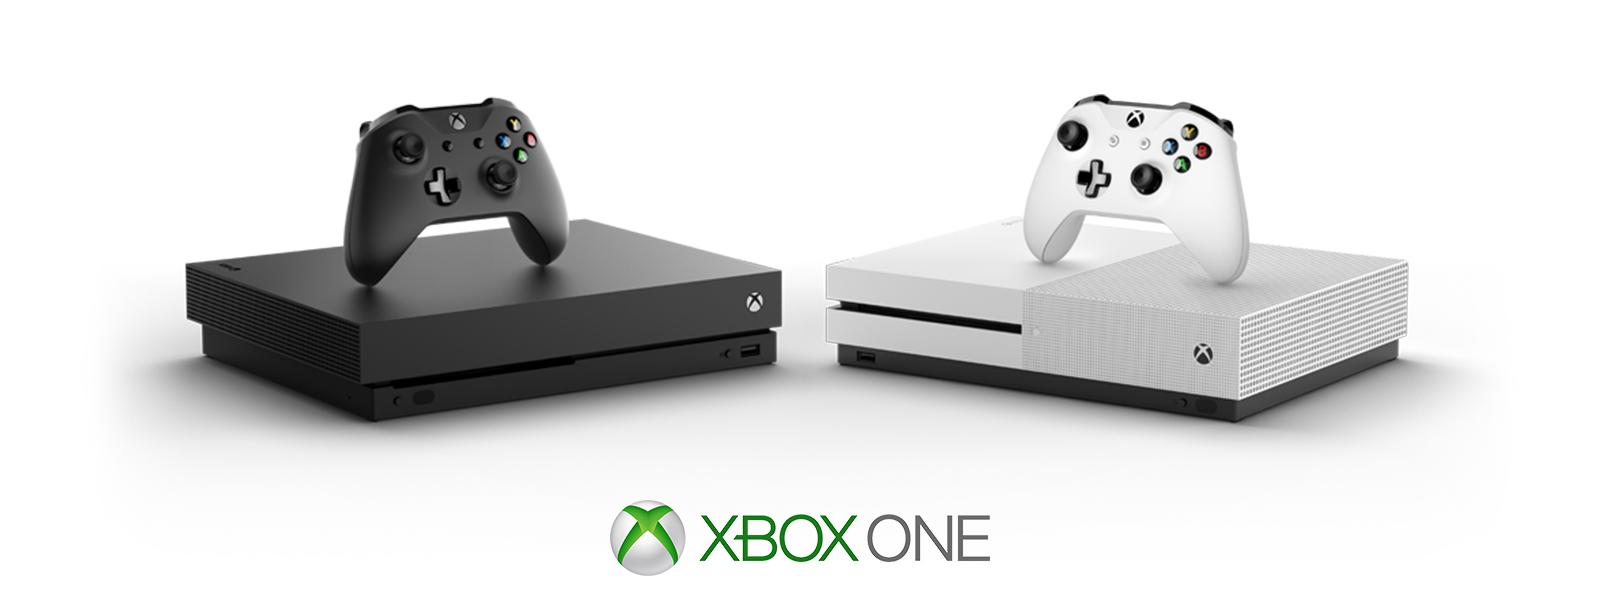 Xbox One X e Xbox One S